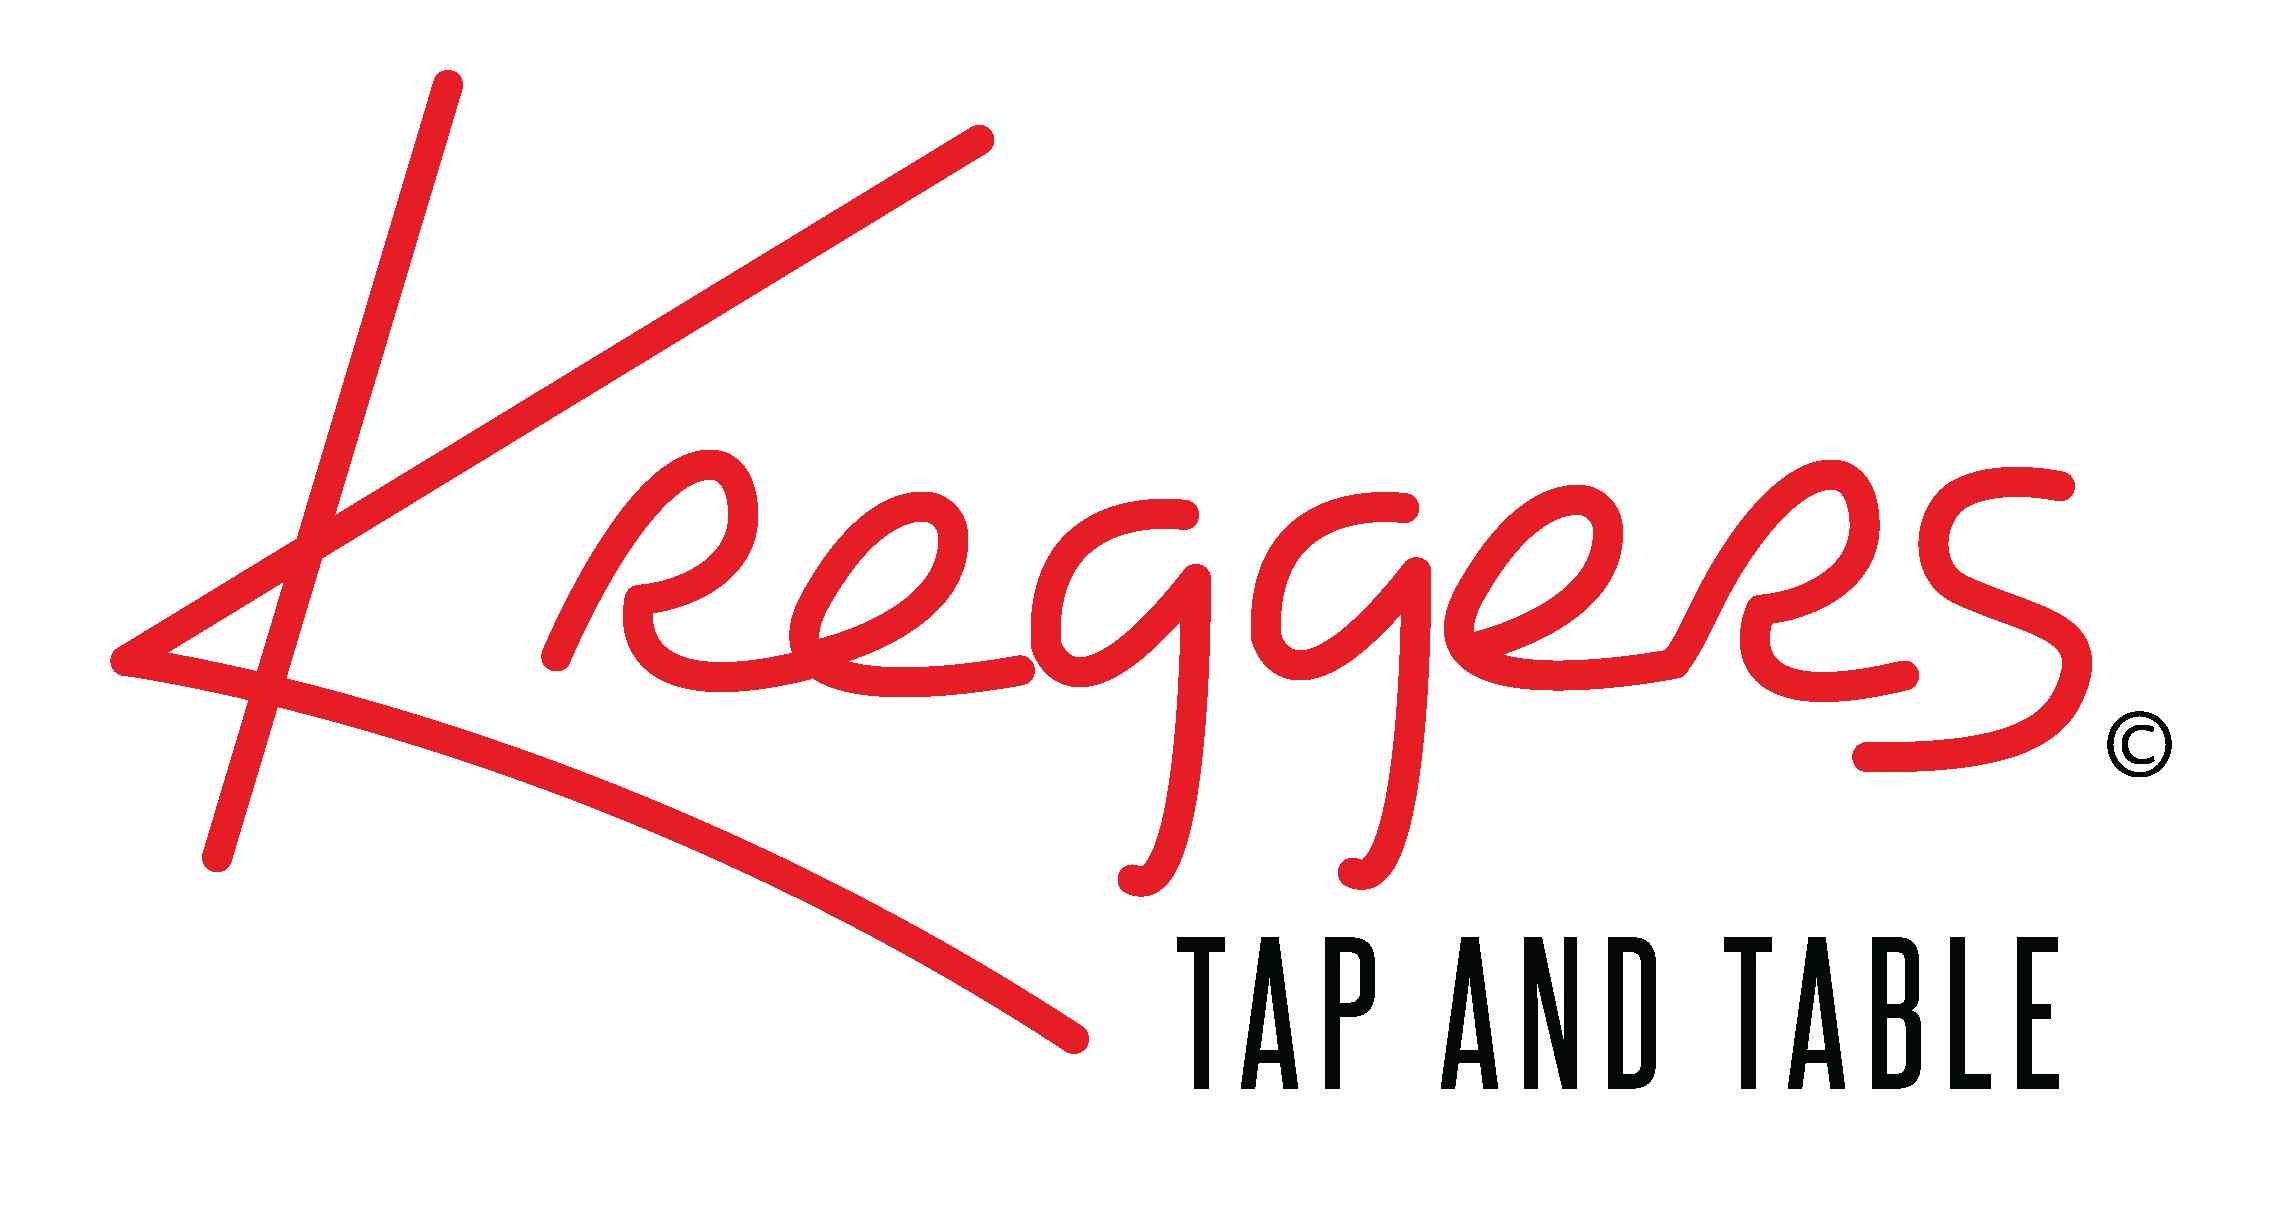 KREGGERS_ashland_logo.png